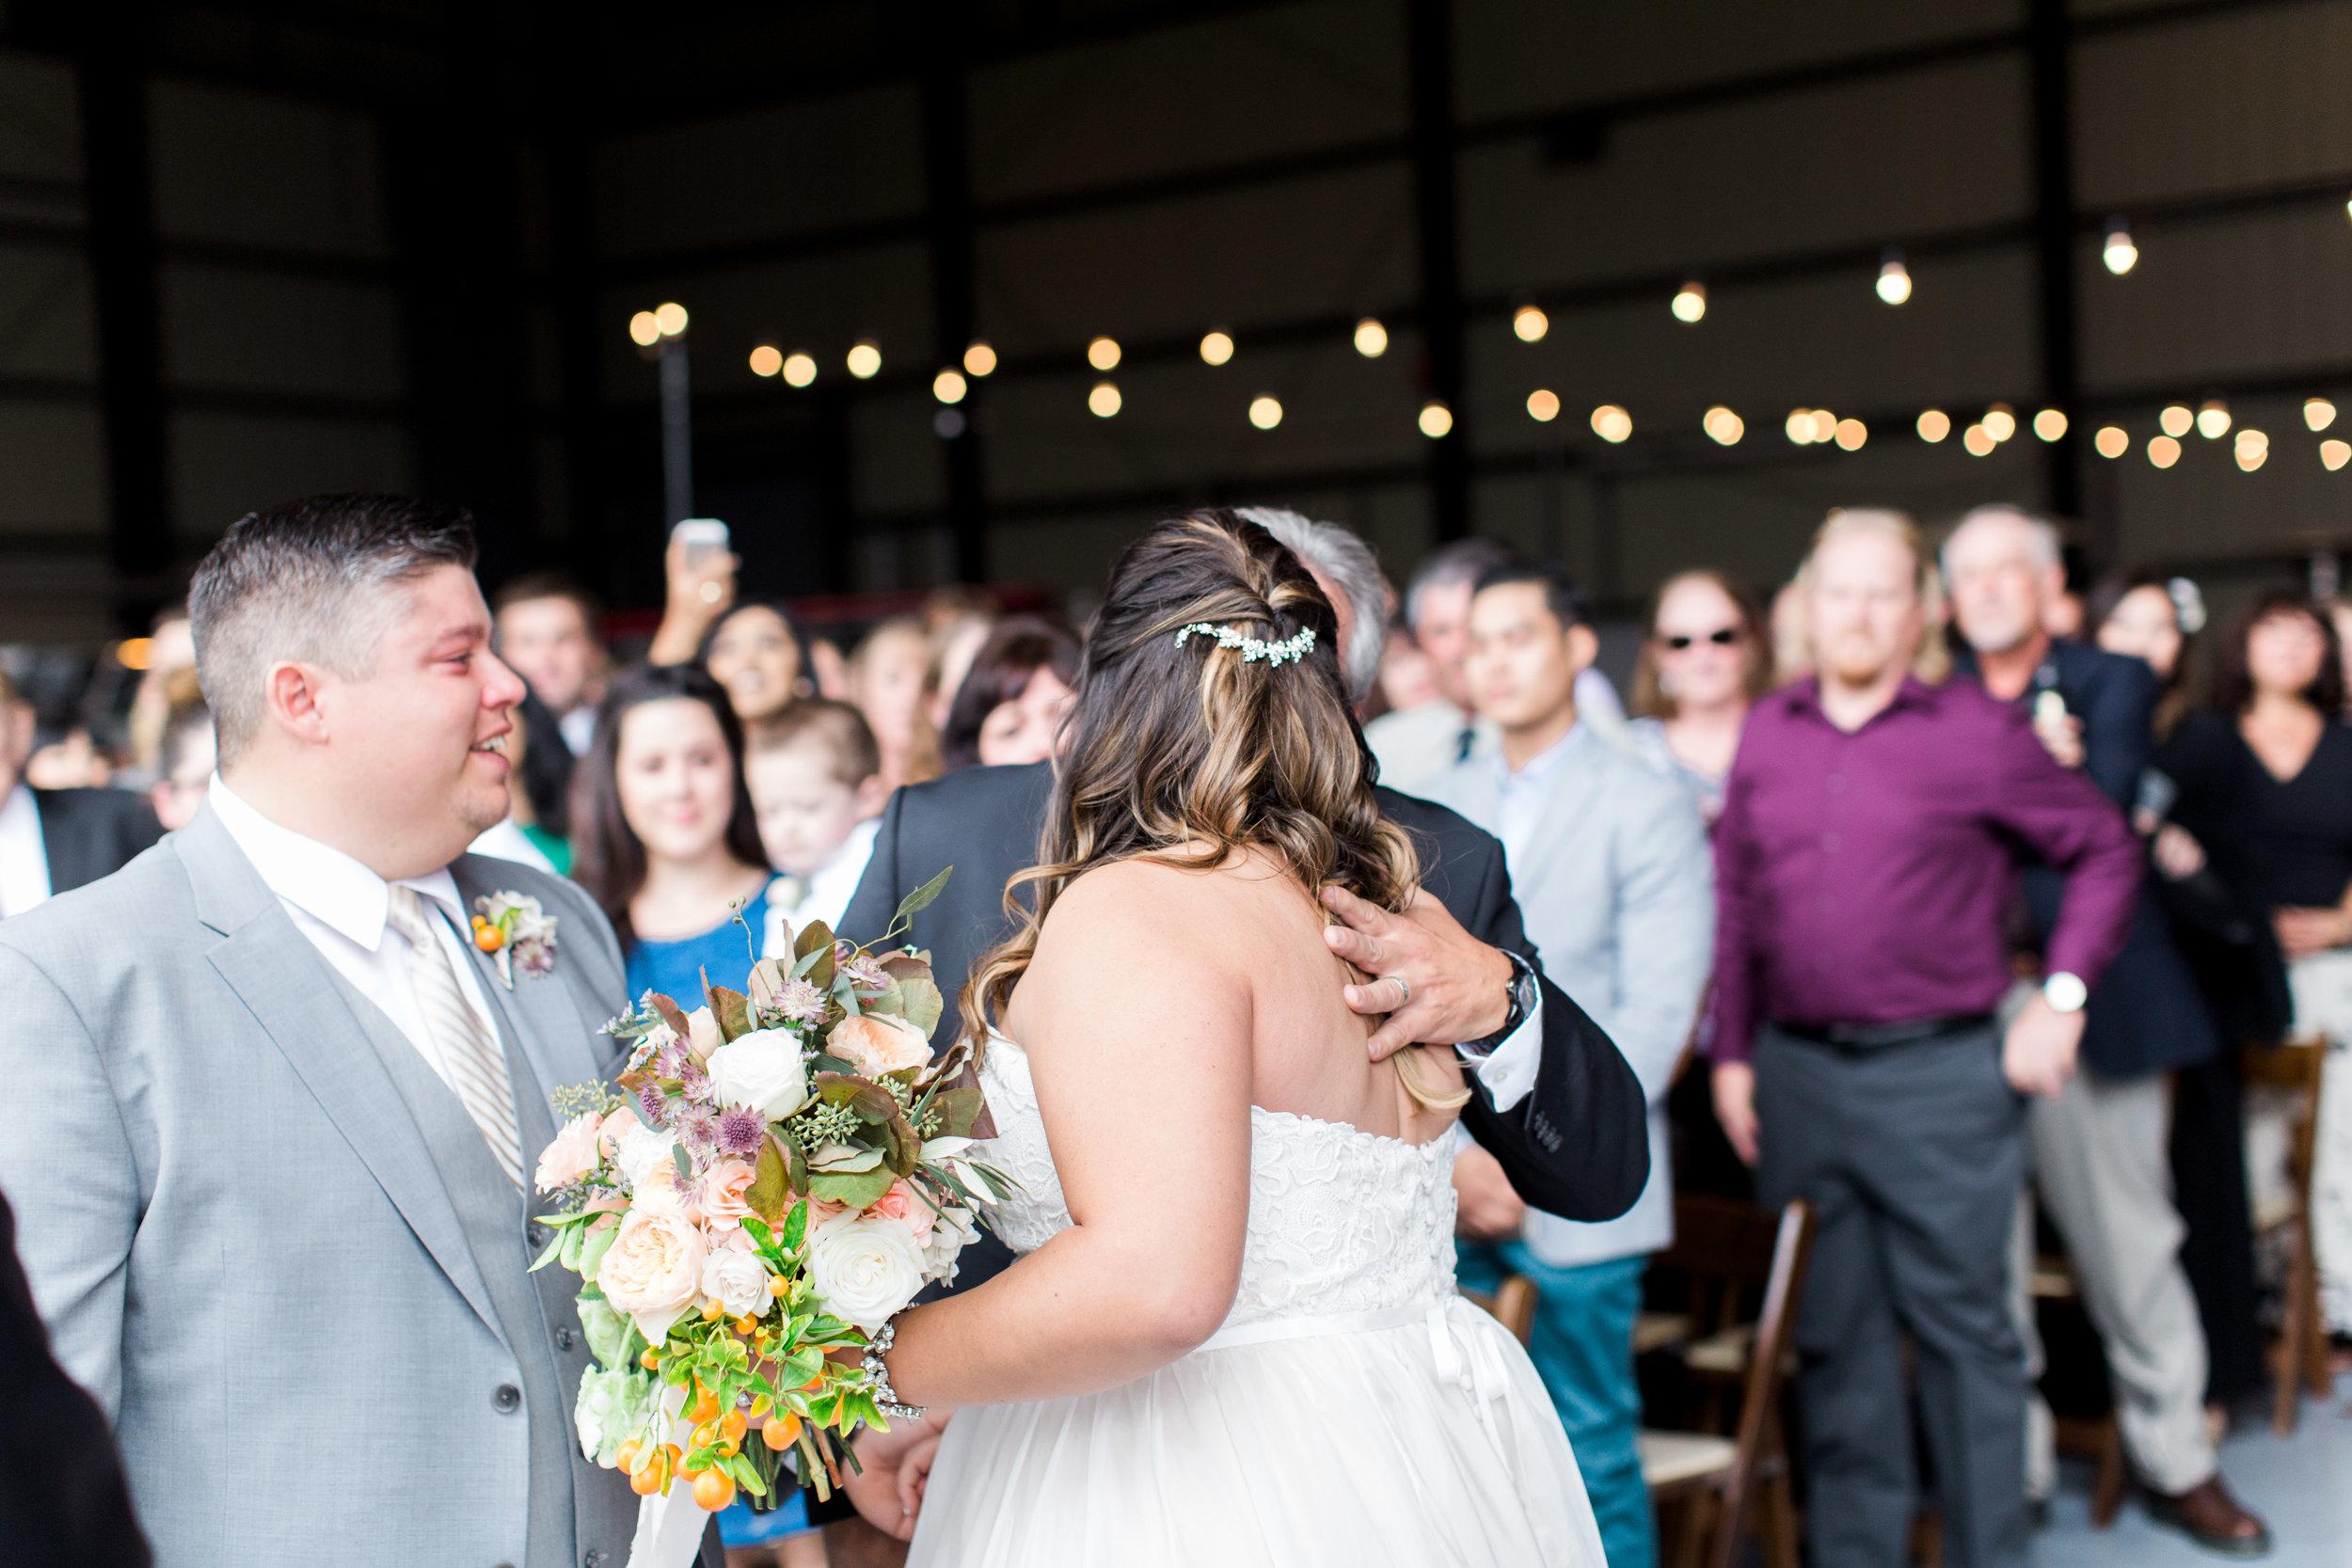 airport-hanger-wedding-at-attitude-aviation-in-livermore-51.jpg